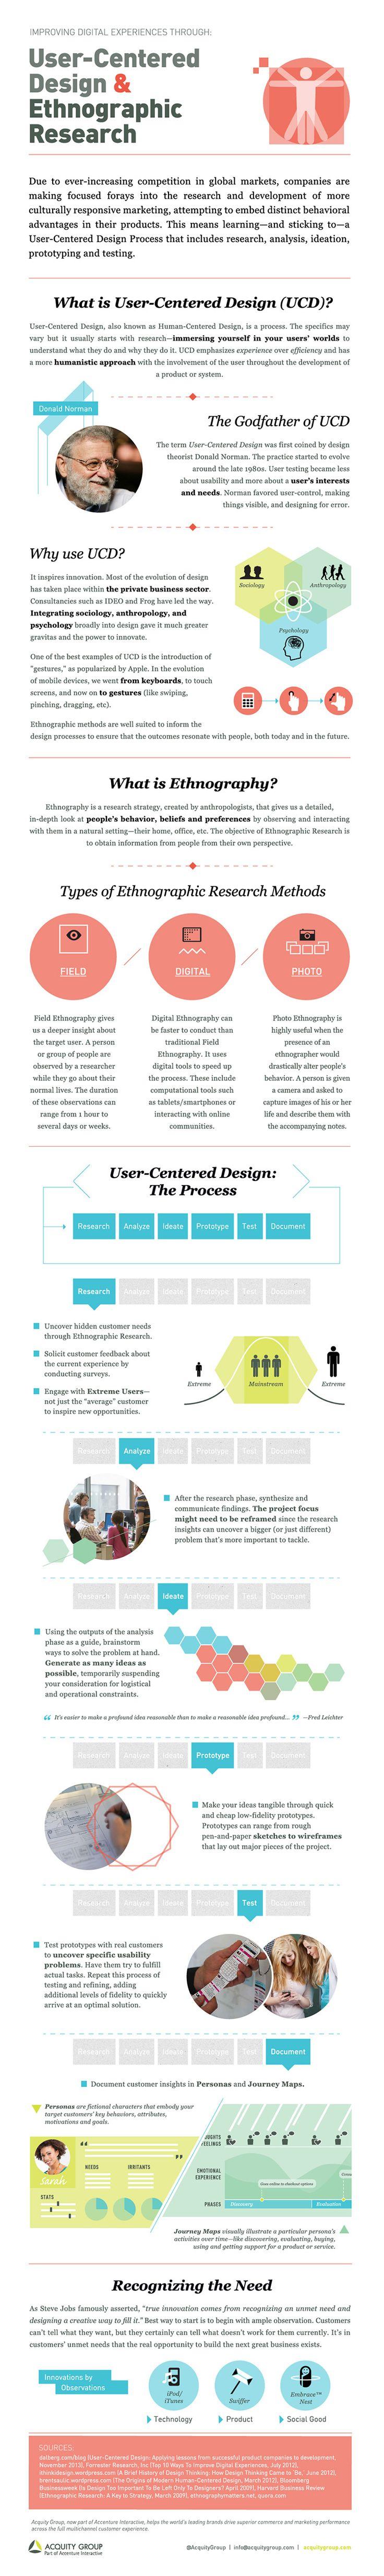 User-Centered Design & Ethnographic Research